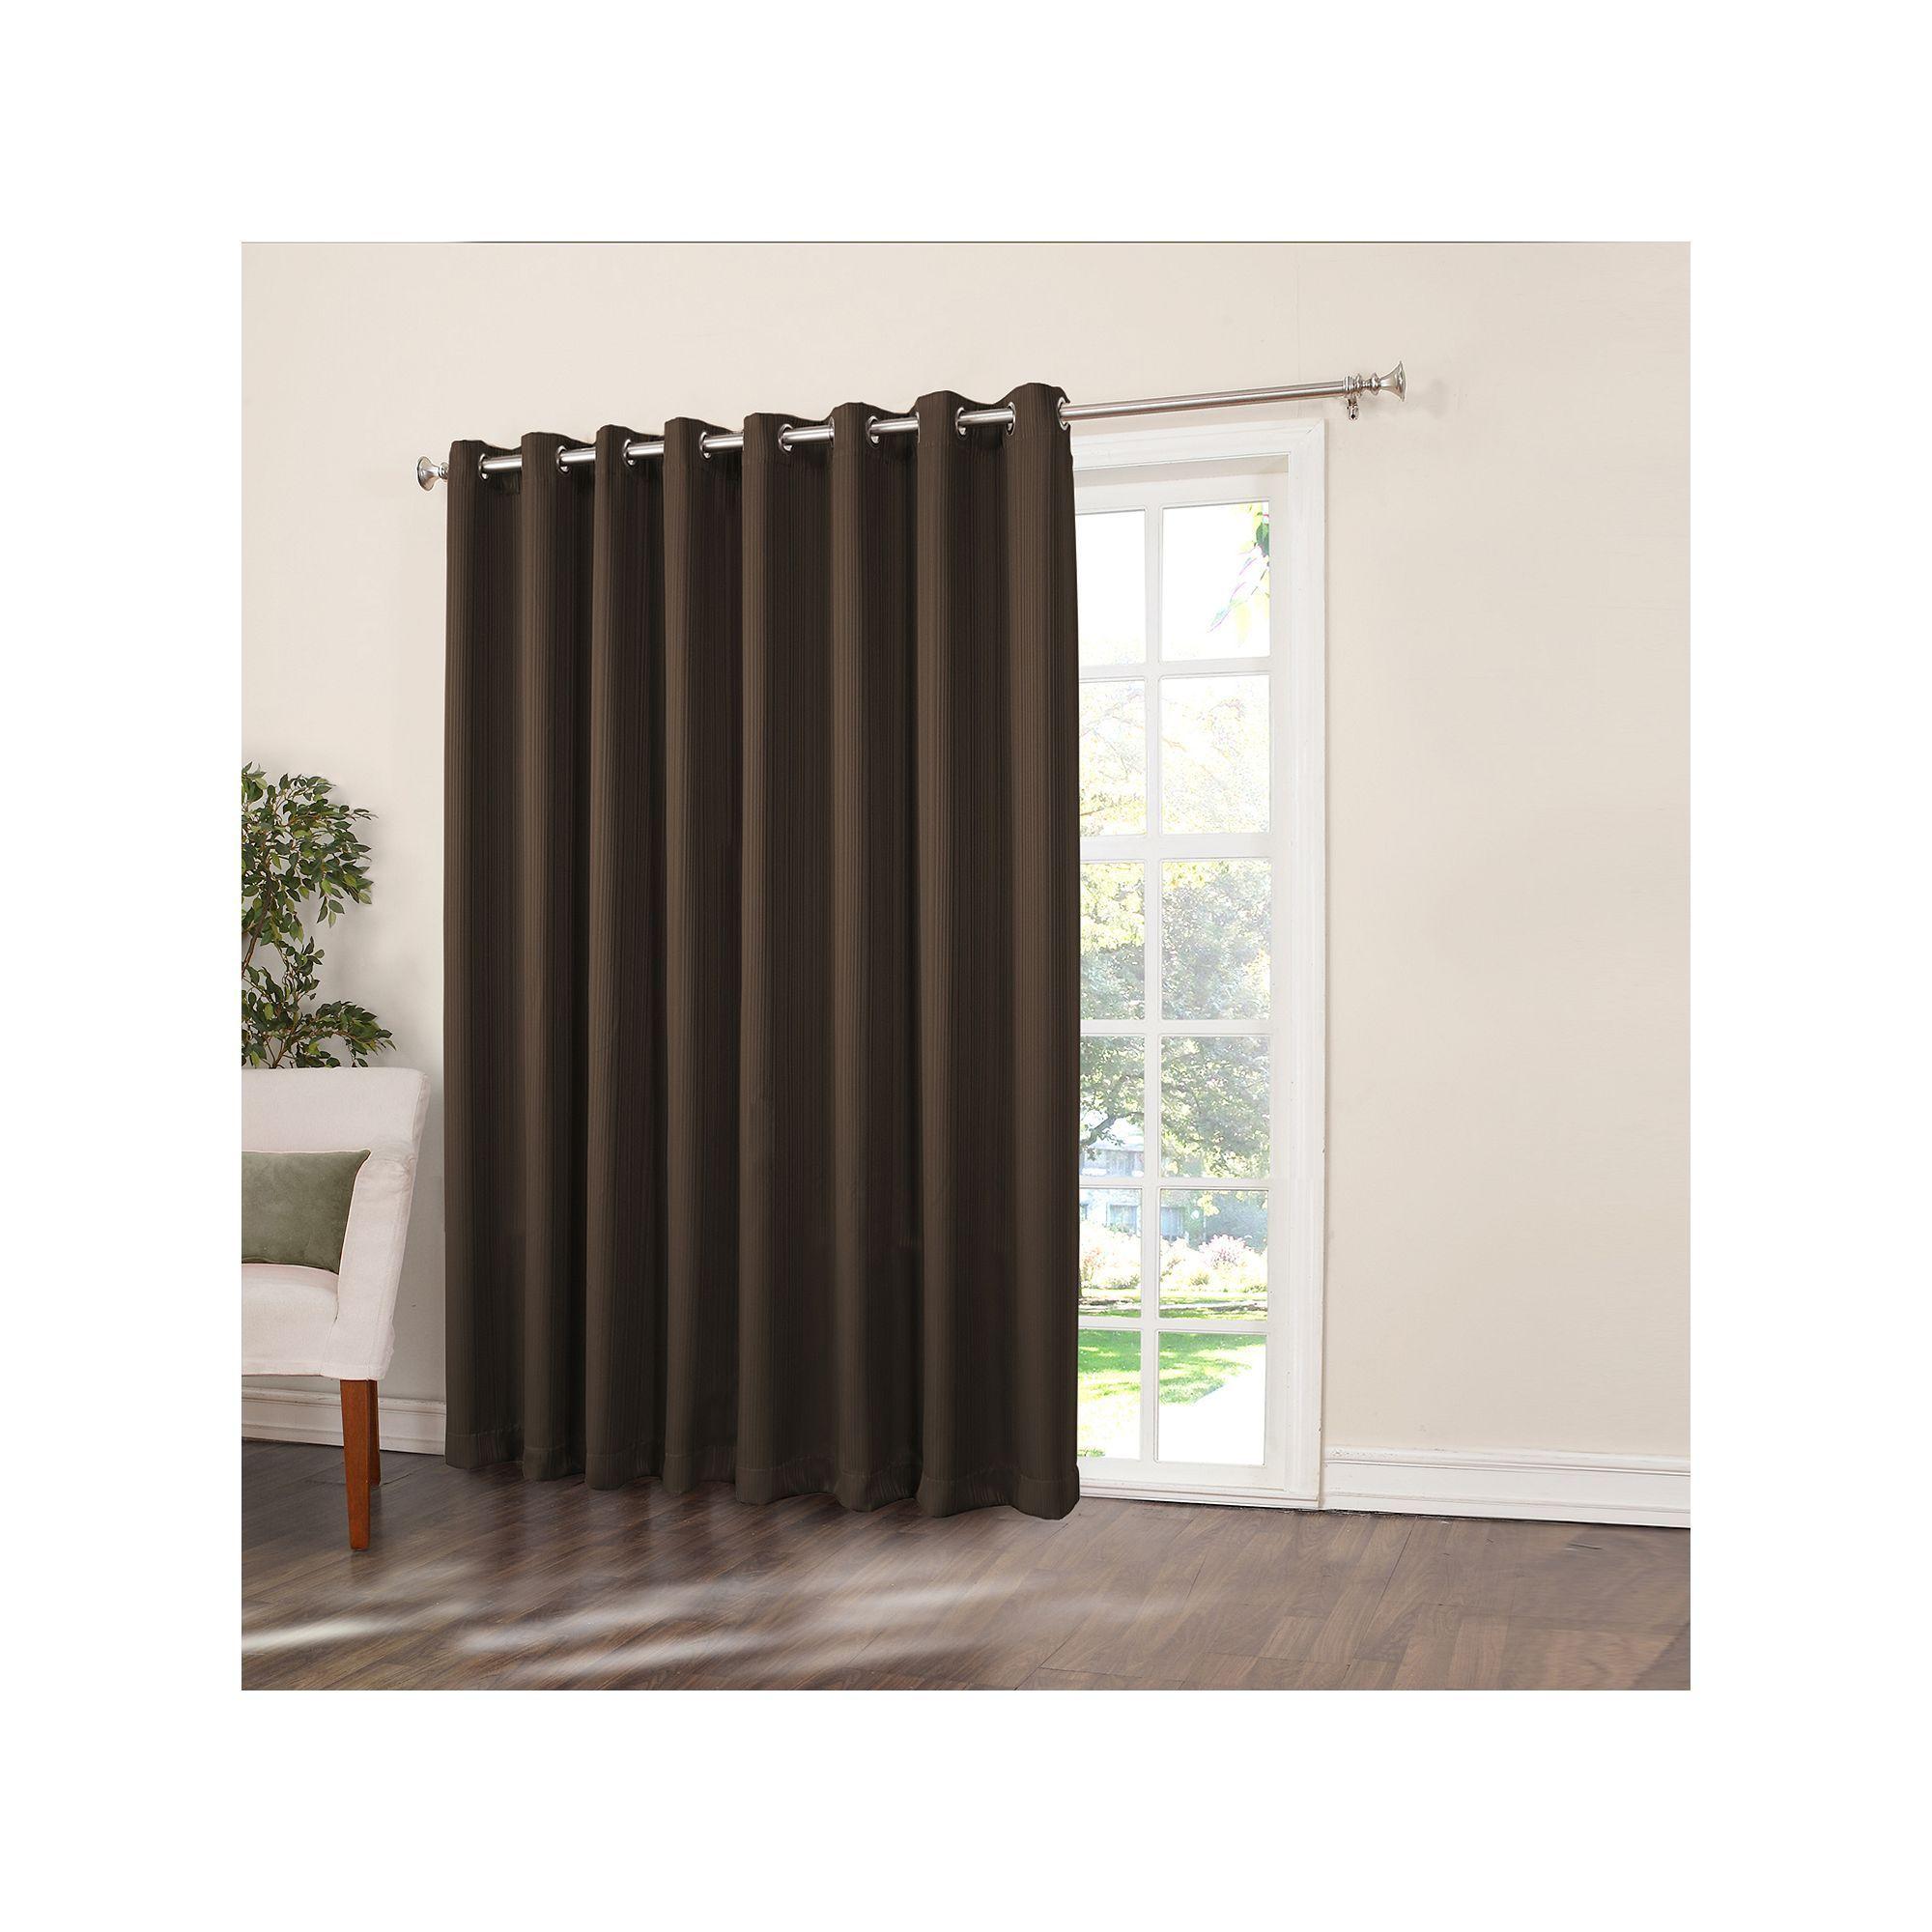 Home classicsethan blackout patio door curtain uu x